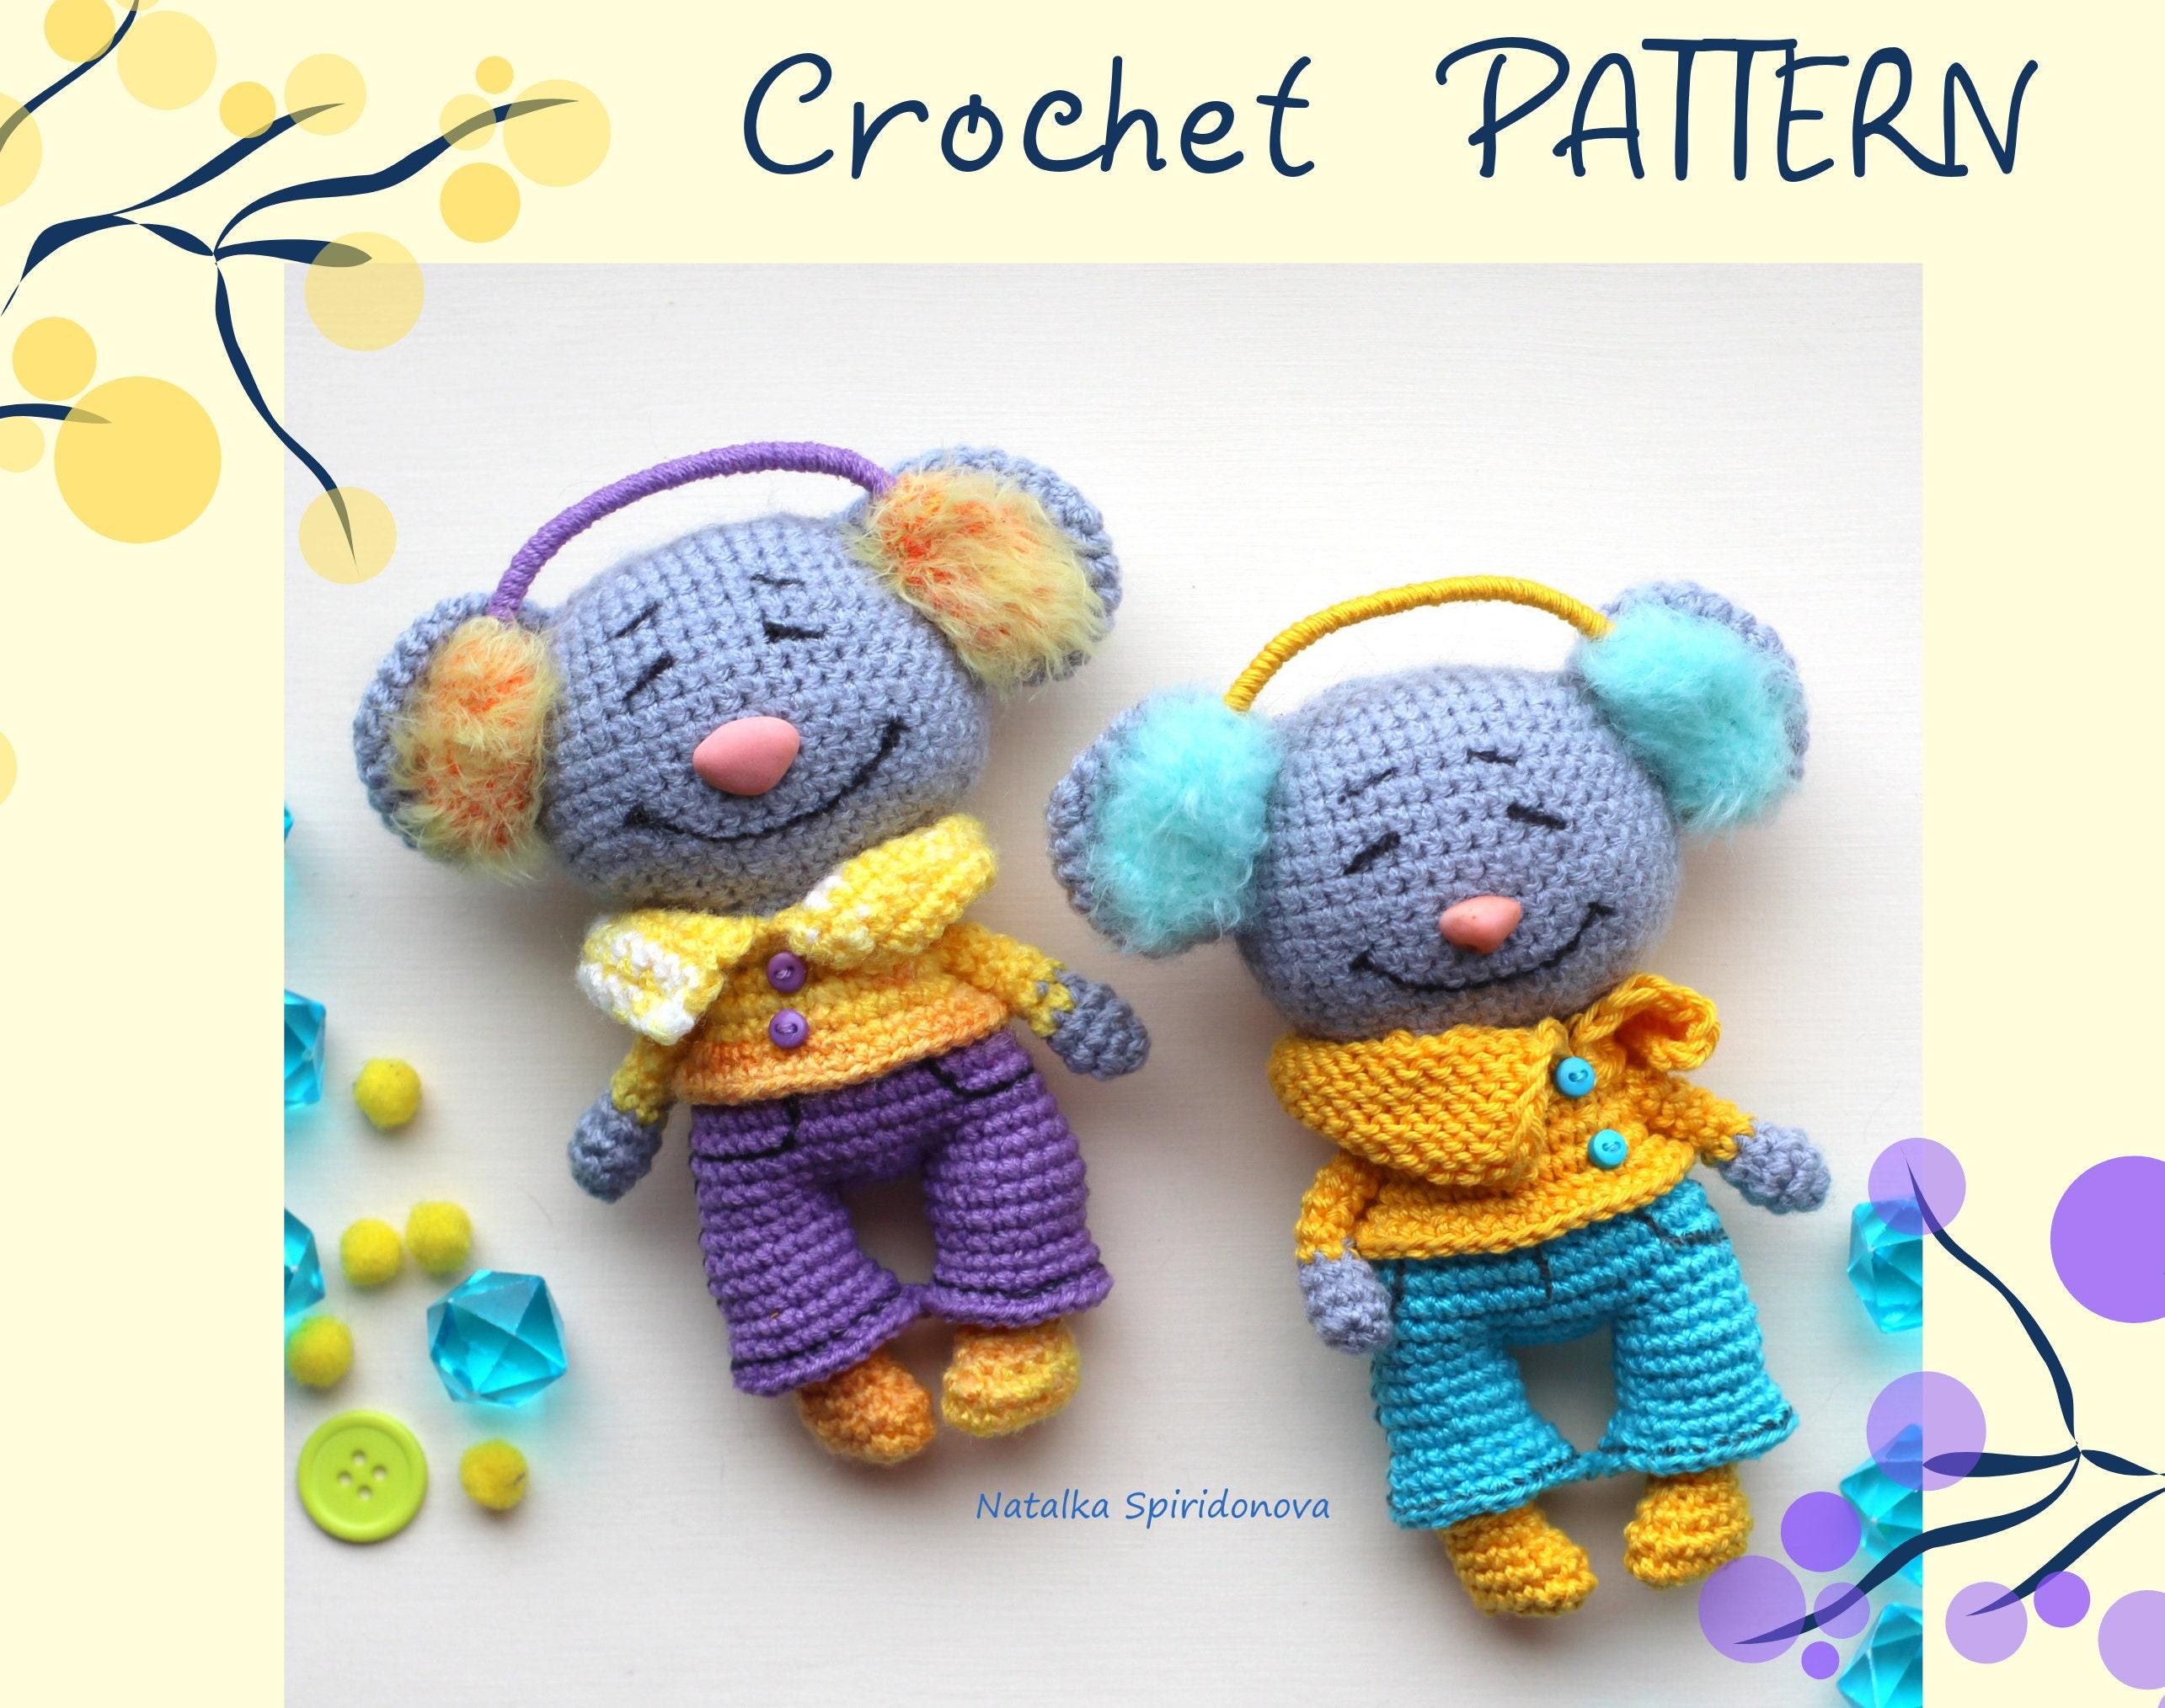 Pocket Amigurumi: 20 Mini Monsters to Crochet and Collect: Amazon ... | 2028x2570